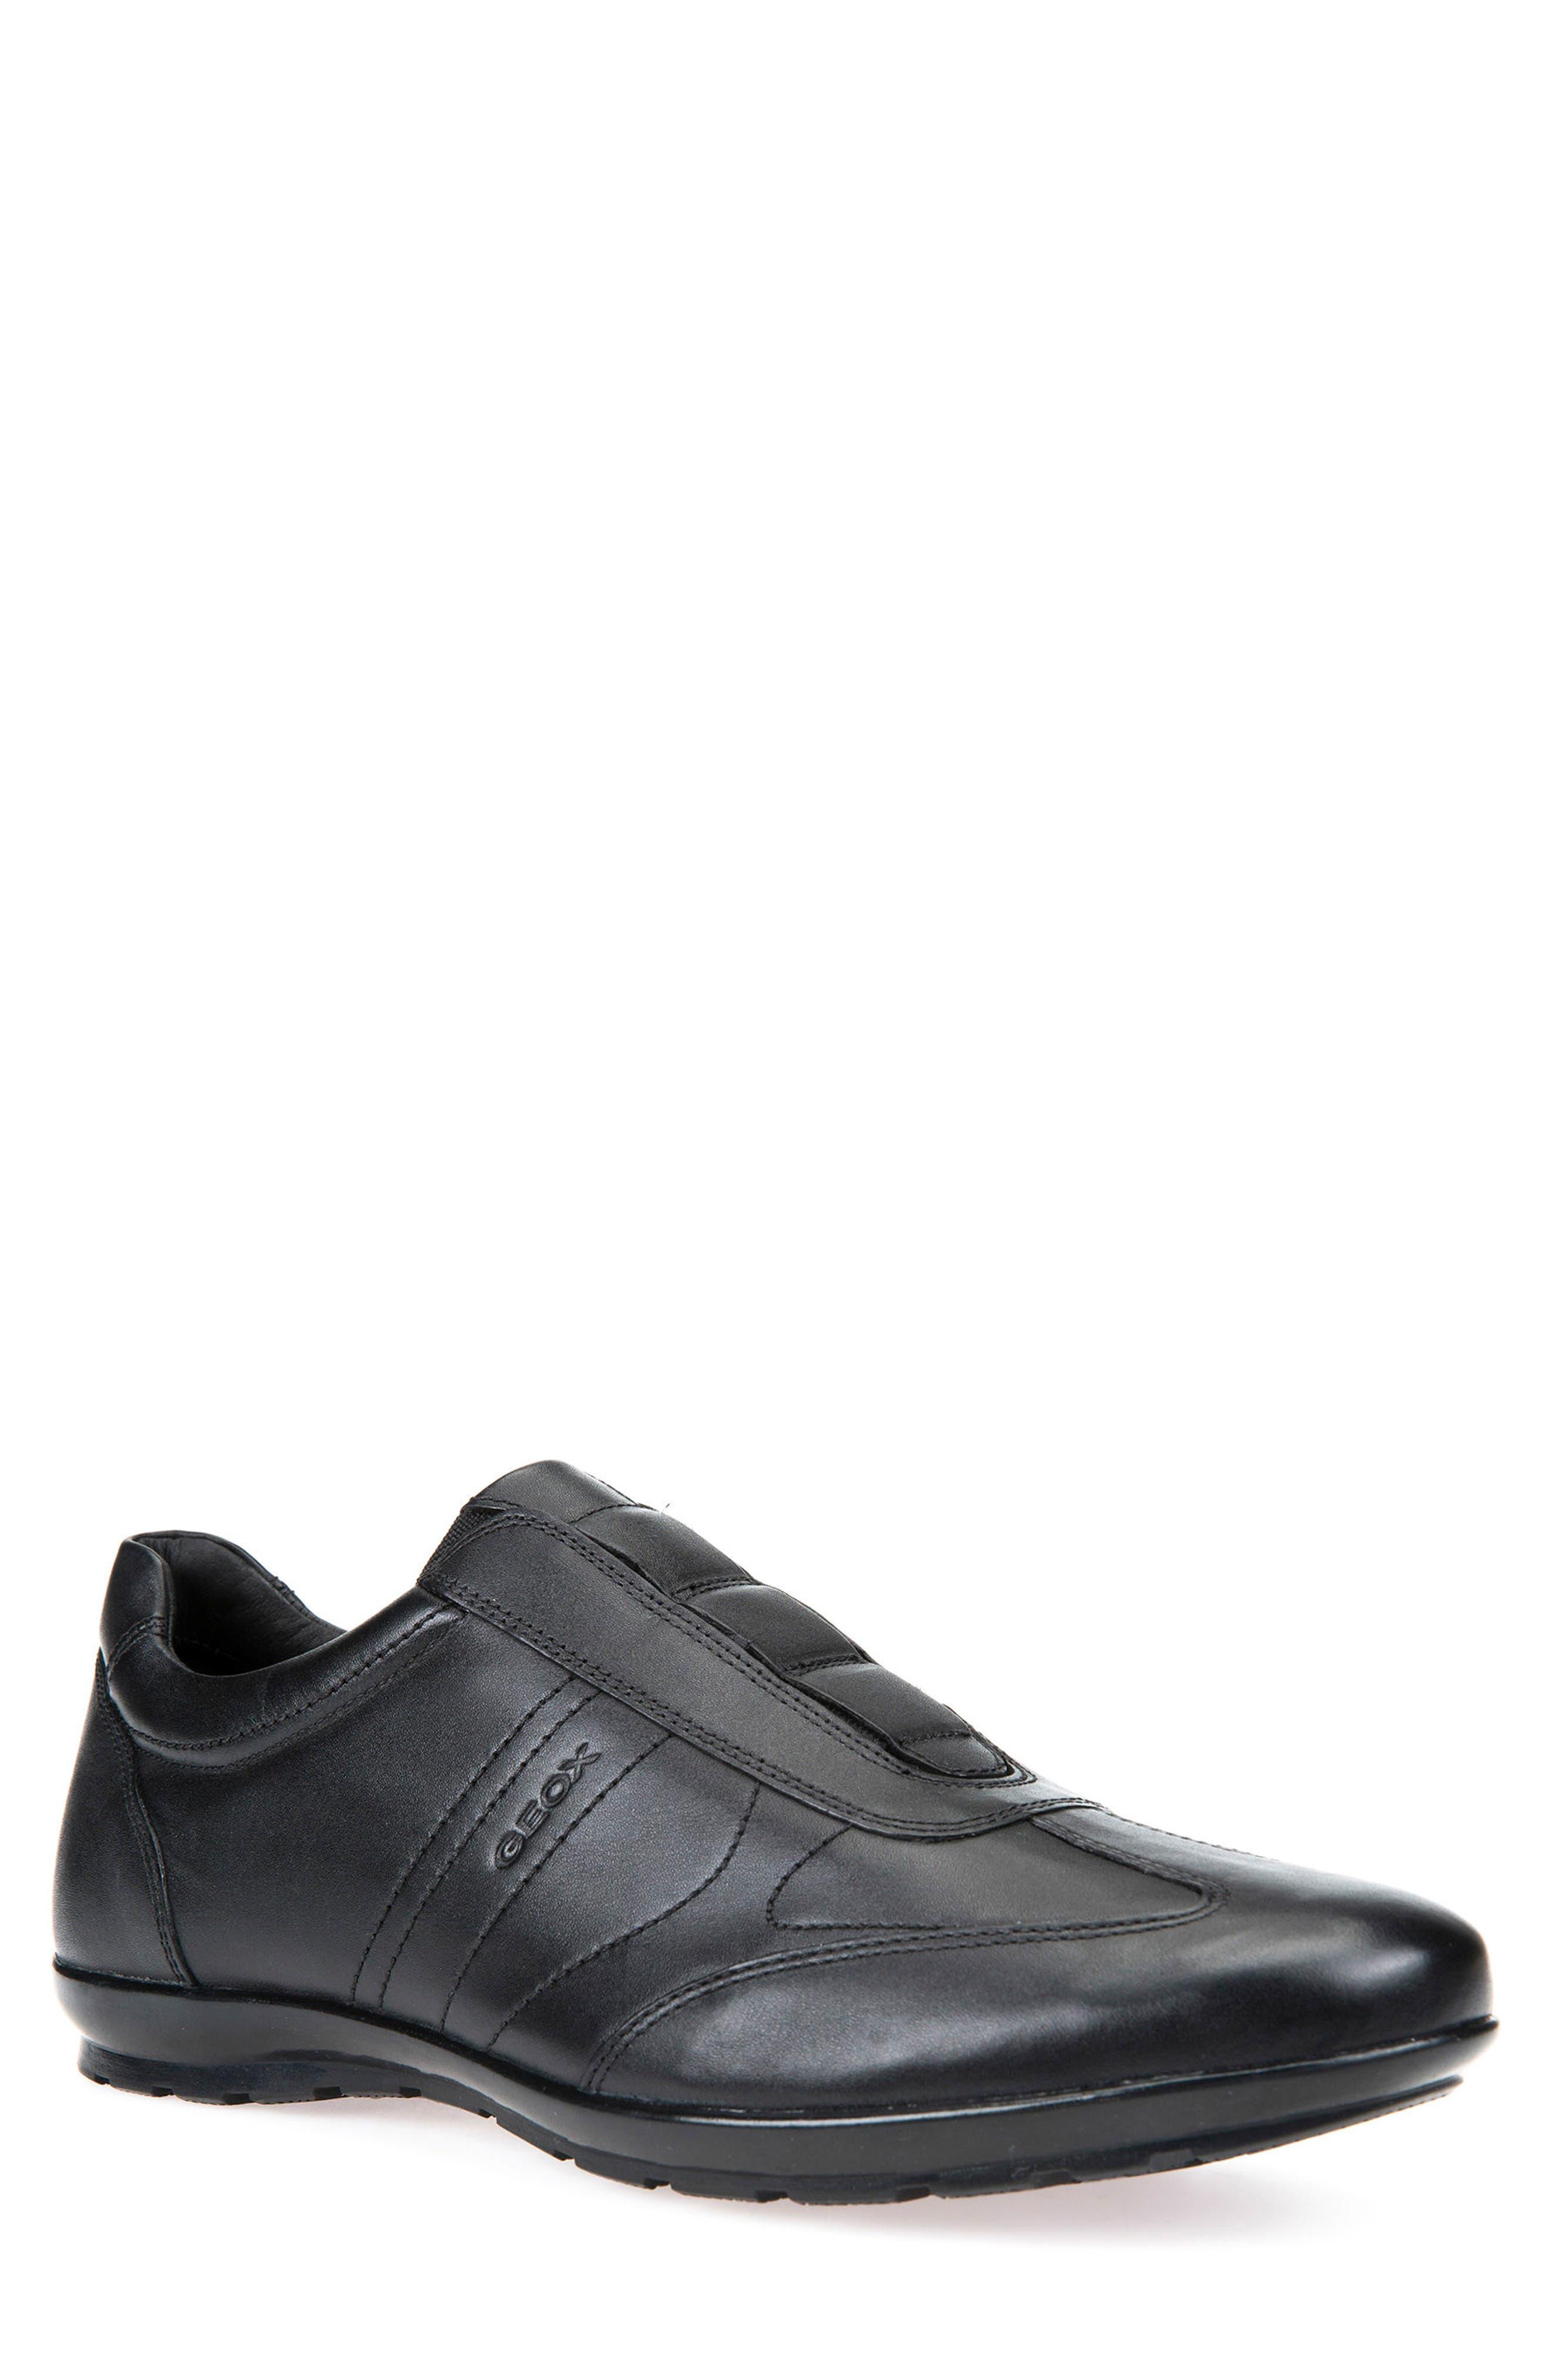 Symbol 21 Slip-On Sneaker,                             Main thumbnail 1, color,                             BLACK LEATHER